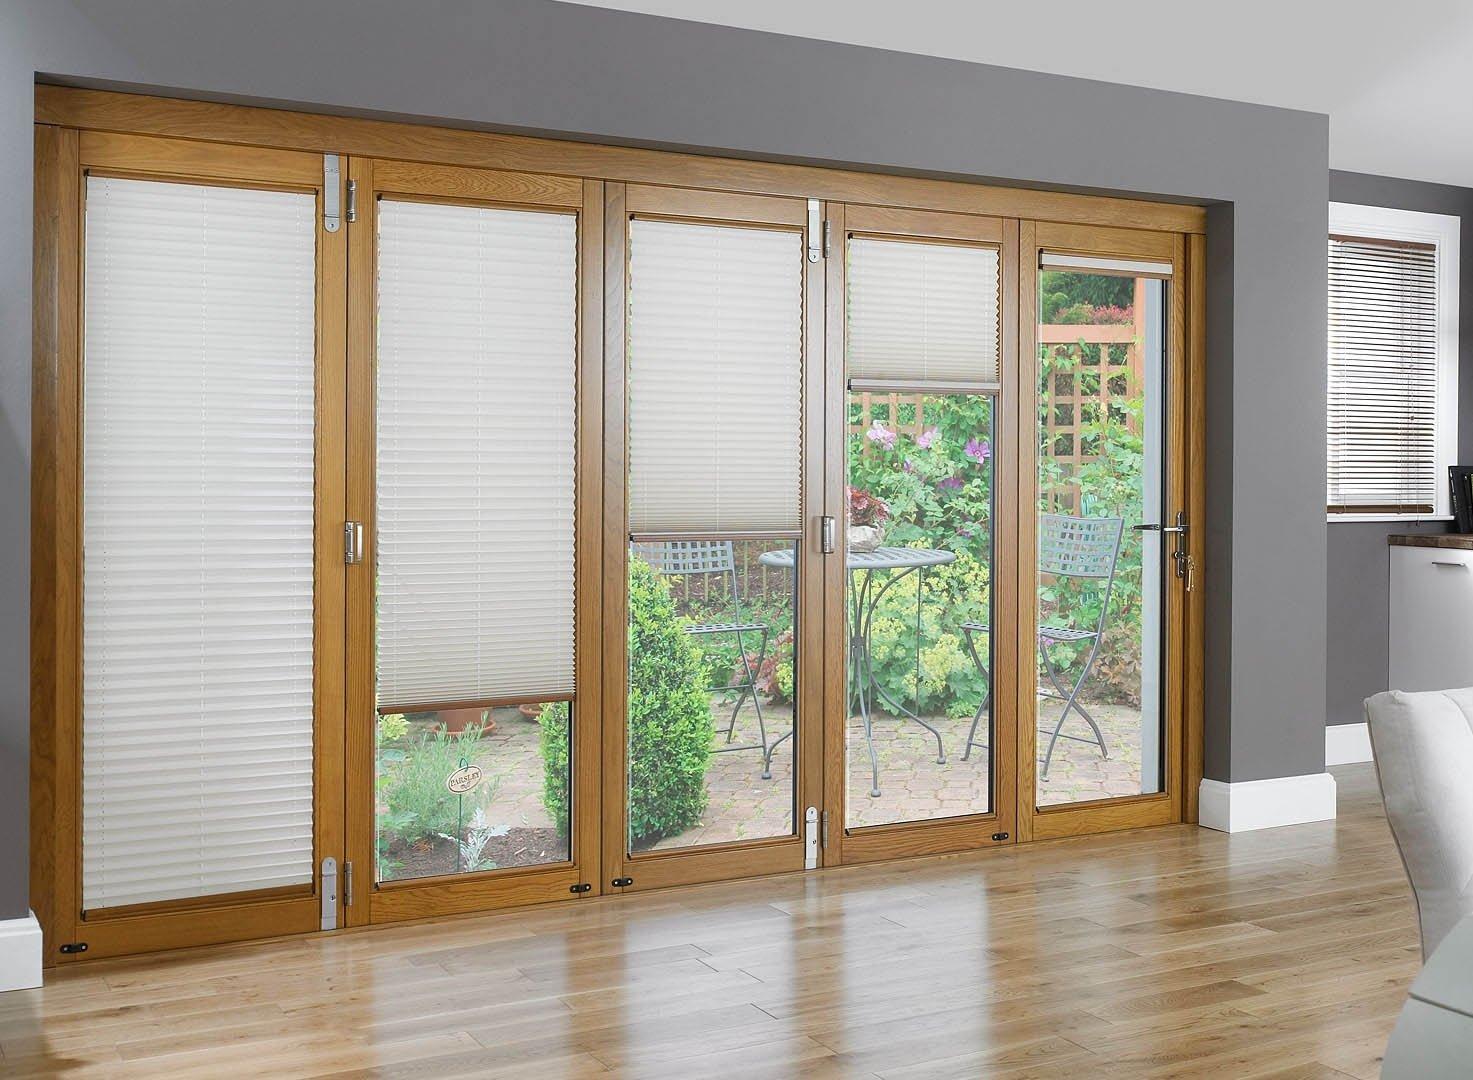 10 Elegant Window Treatment Ideas For French Doors 15 window treatments for sliding glass doors ideas hgnv 2020